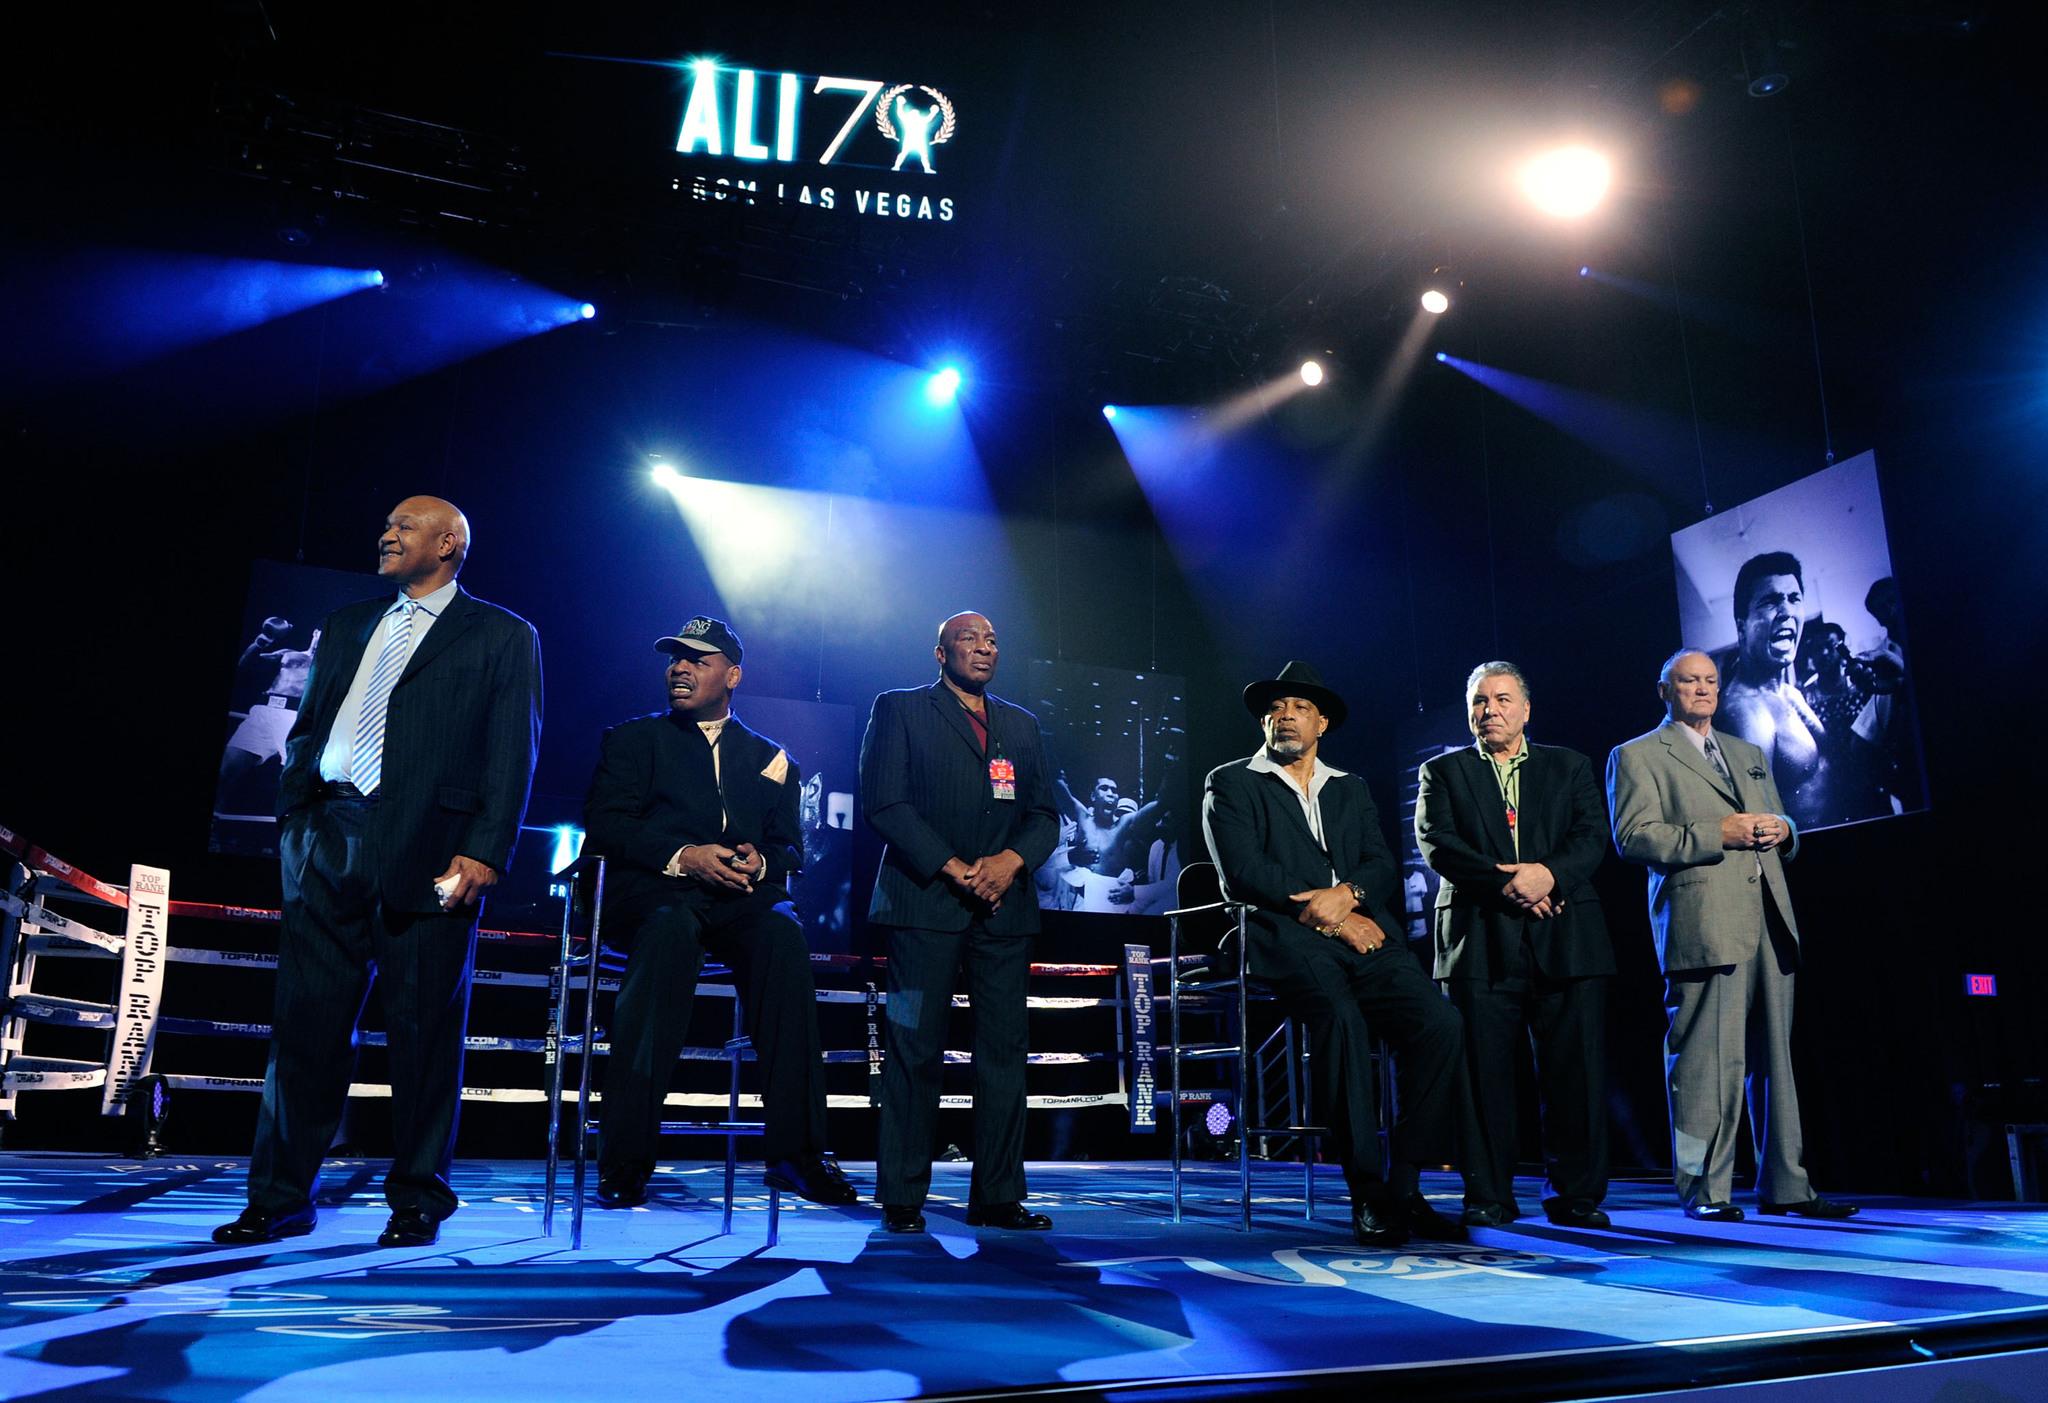 Muhammad Ali, George Chuvalo, George Foreman, Ken Norton, Earnie Shavers, Chuck Wepner, and Leon Spinks